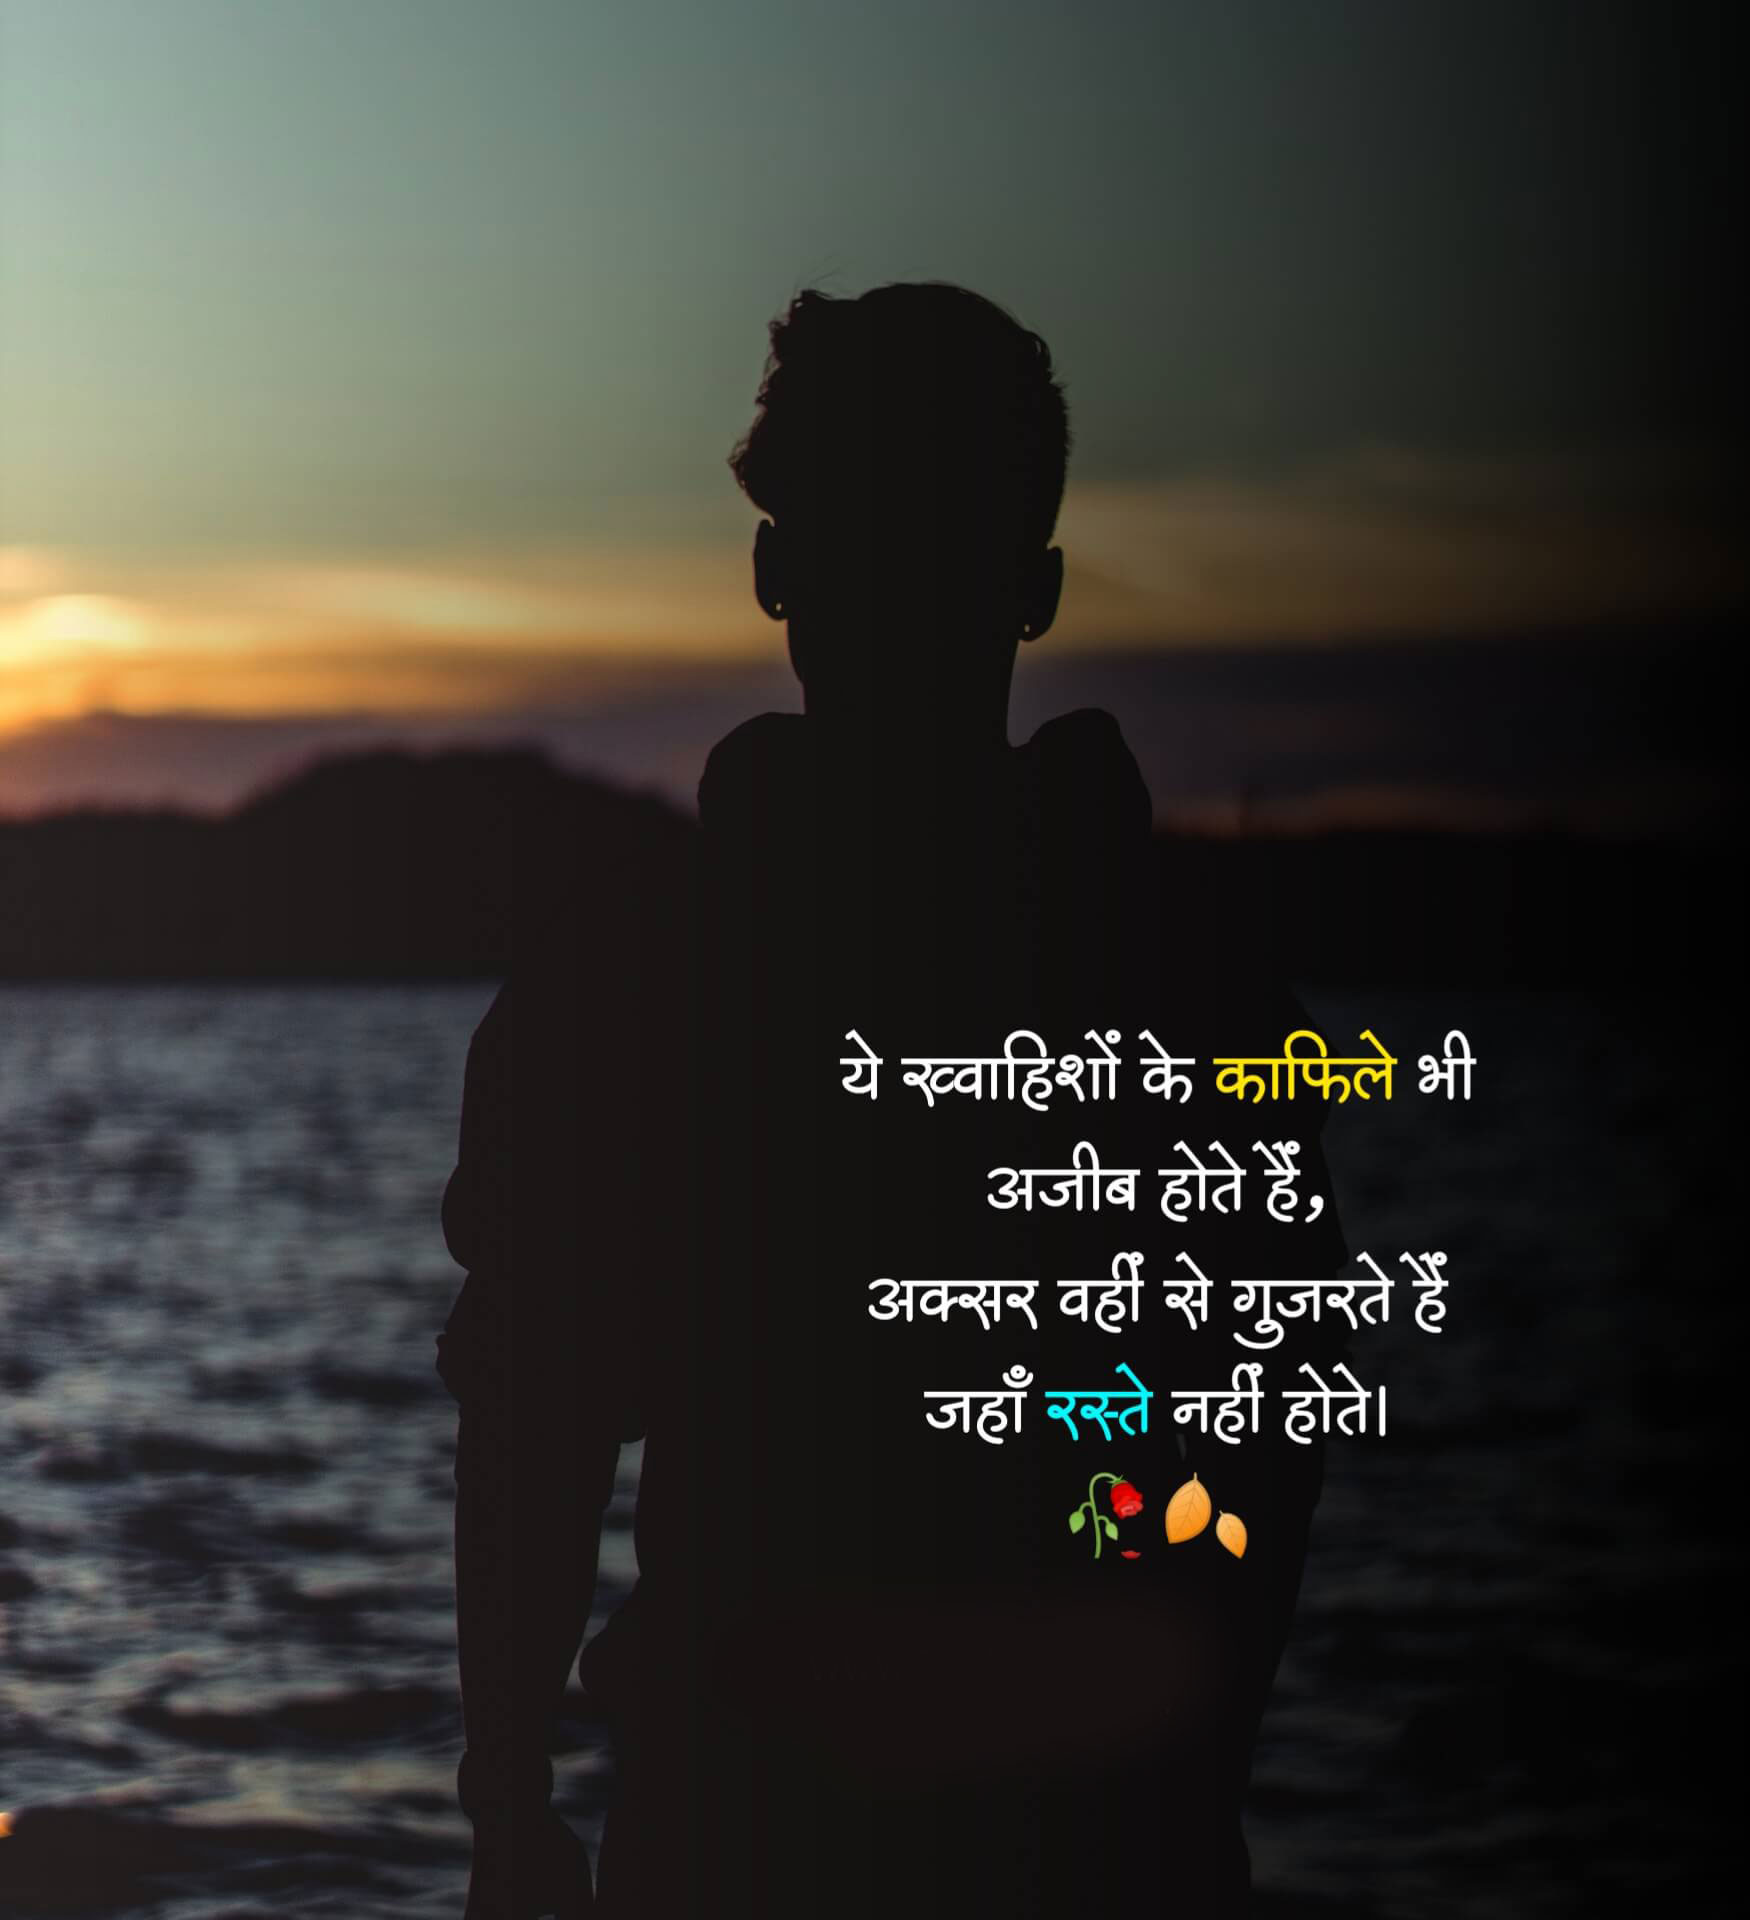 [ Download 2498+ ] Sad Boy Shayari Images Download